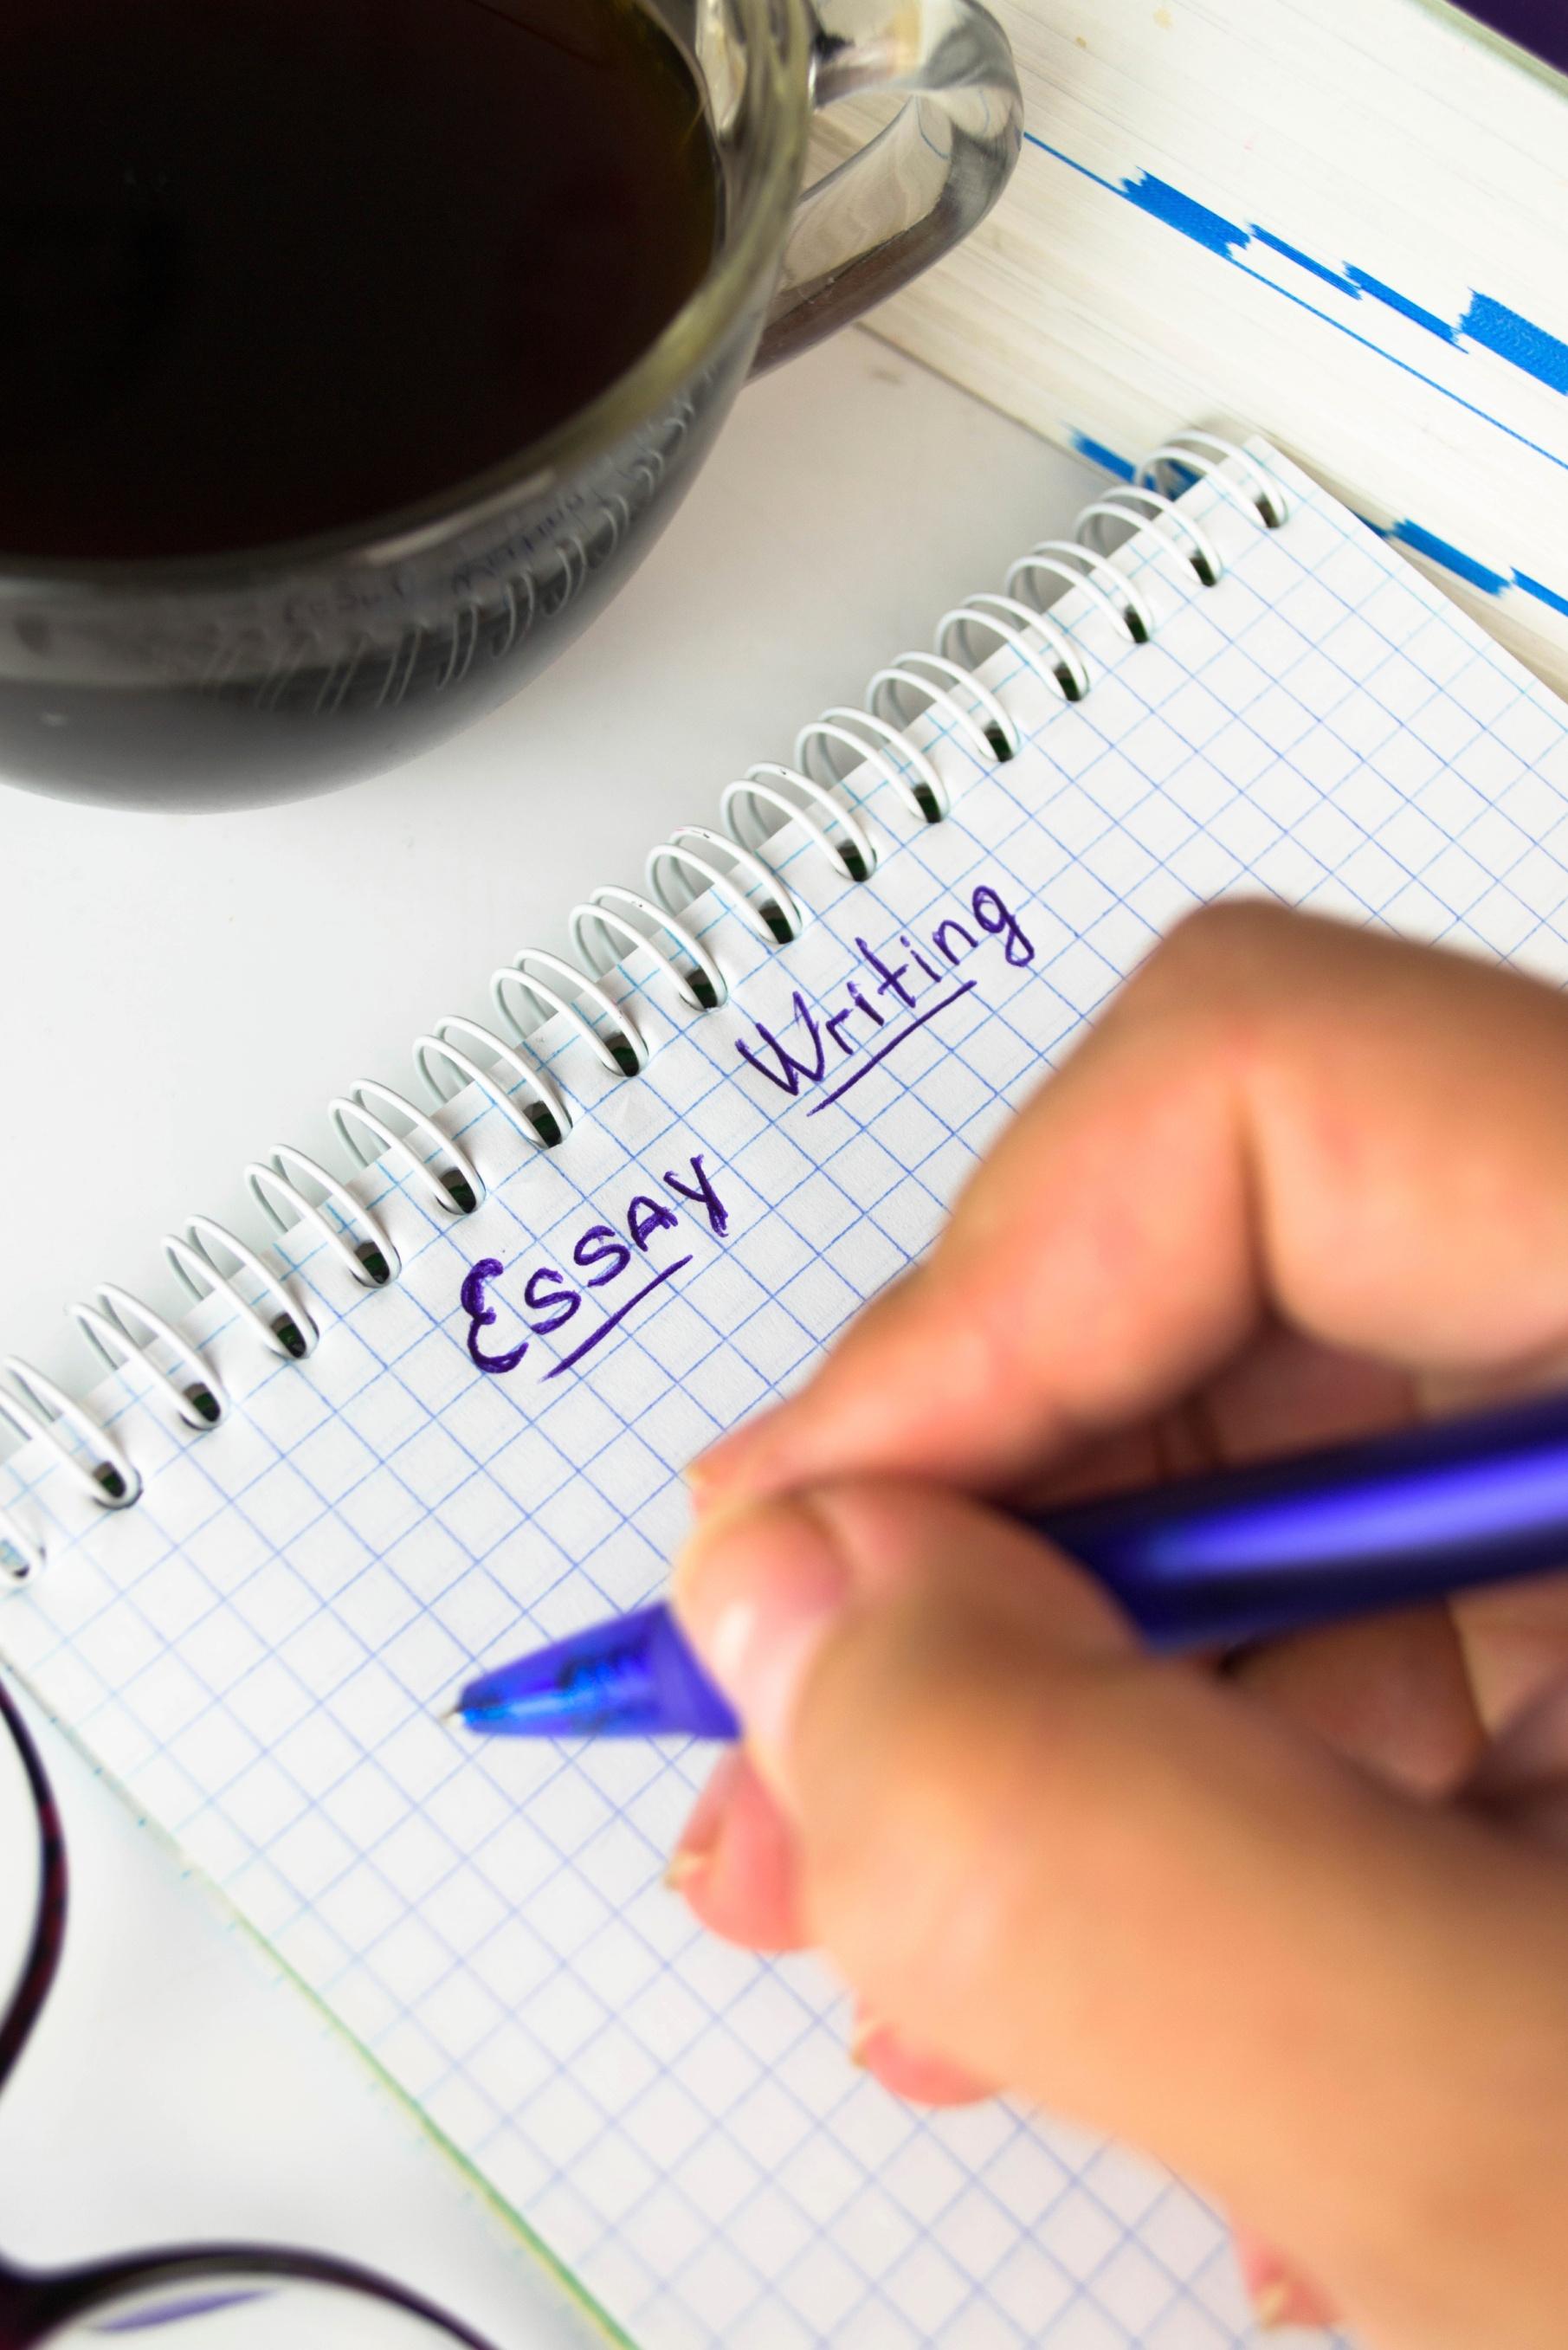 018 Istock 000071353613 Large Mentorship Essay Shocking Mentoring Example Contoh Full